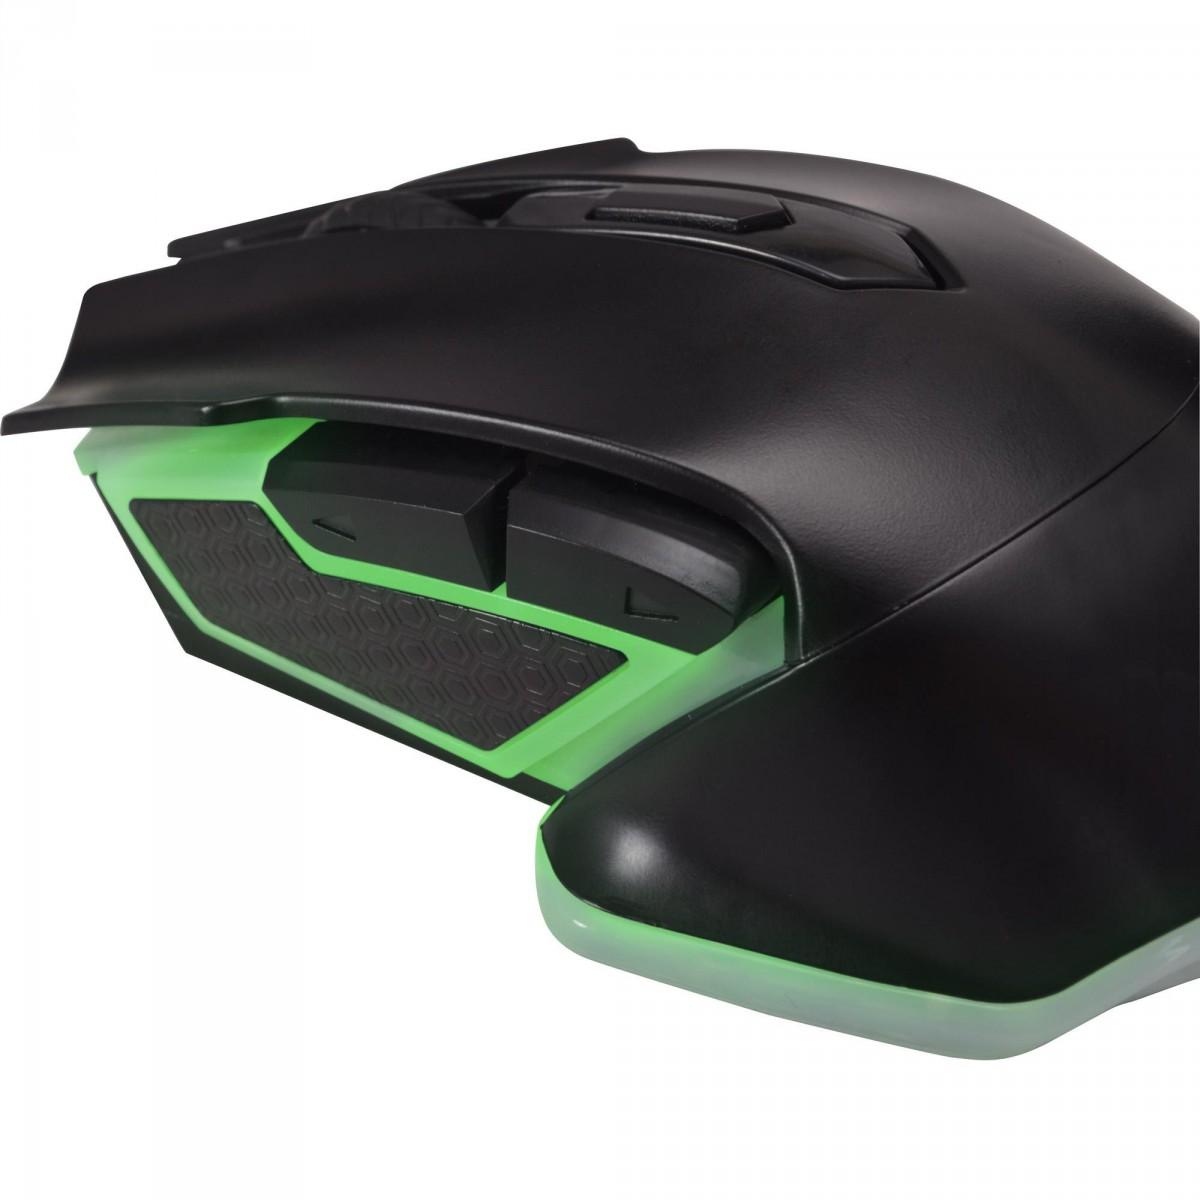 Mouse Gamer Fortrek Pro M5 RGB, 4800 DPI, 6 Botões, Black, 64385